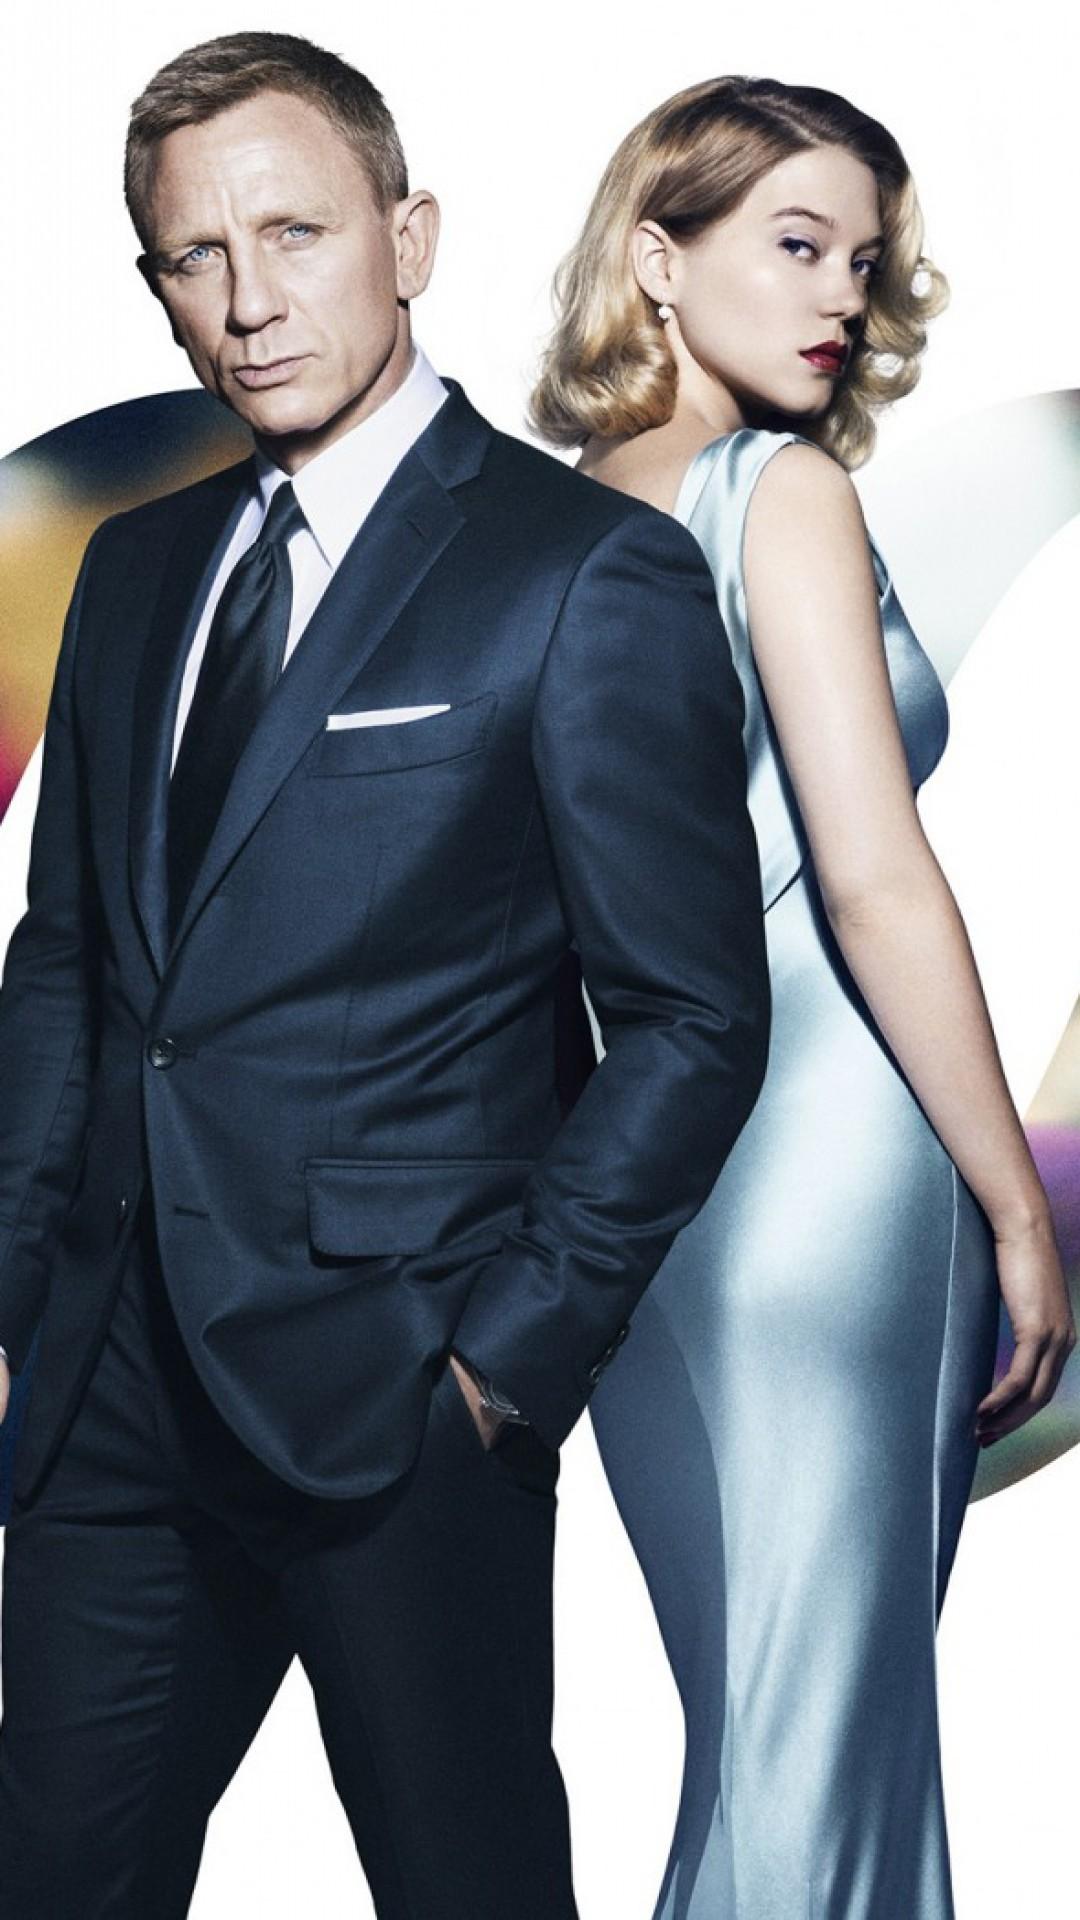 Res: 1080x1920, James Bond Spectre wallpapers.  spectre_james_bond_daniel_craig_lea_seydoux_madeleine_swann_104598_